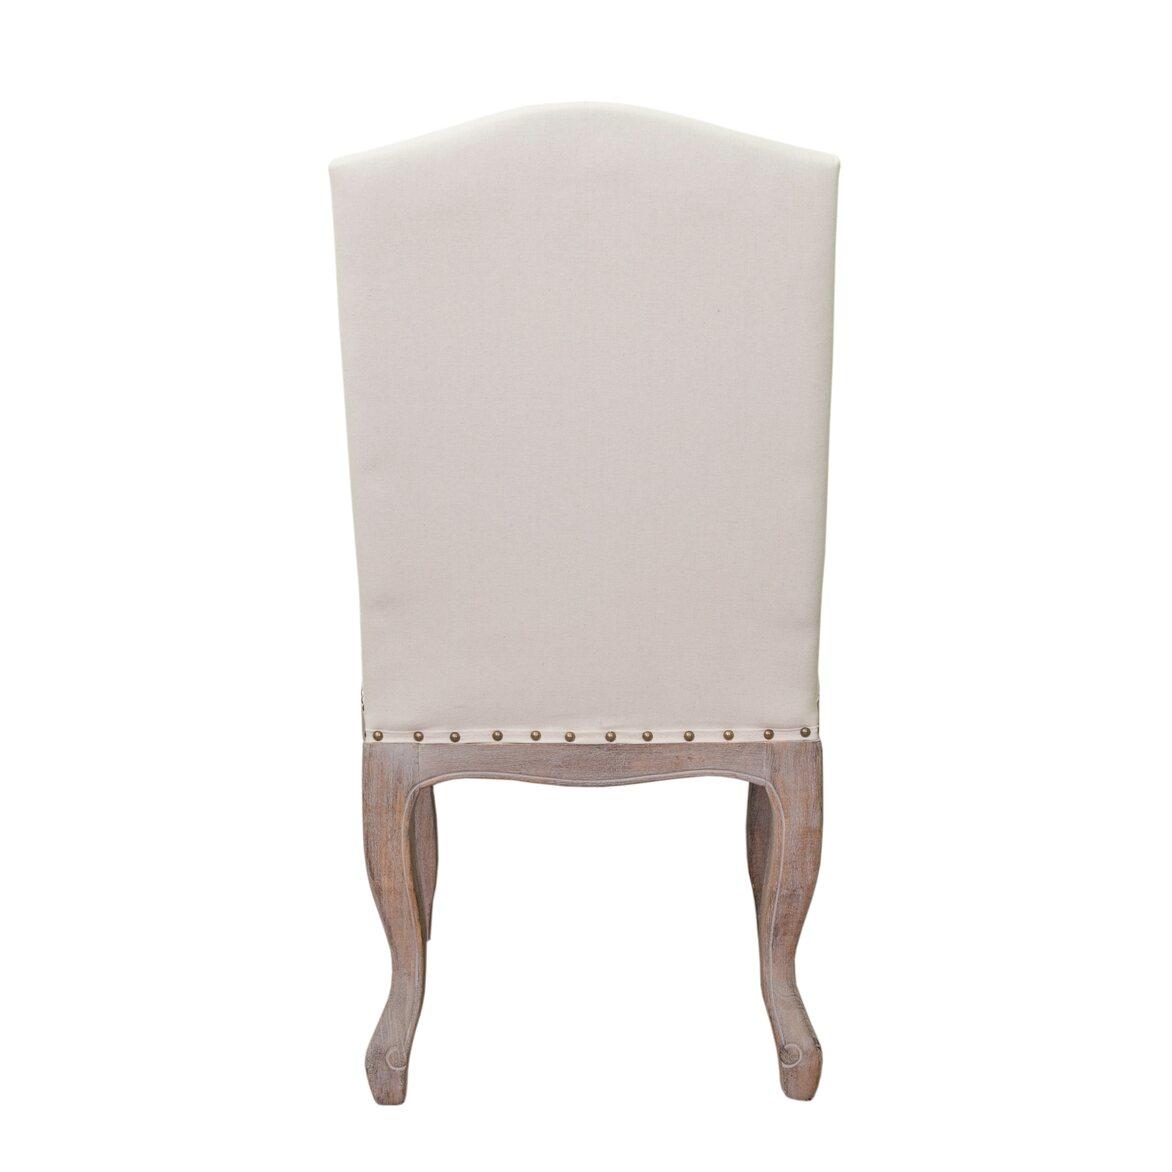 Стул Melis beige 3 | Обеденные стулья Kingsby